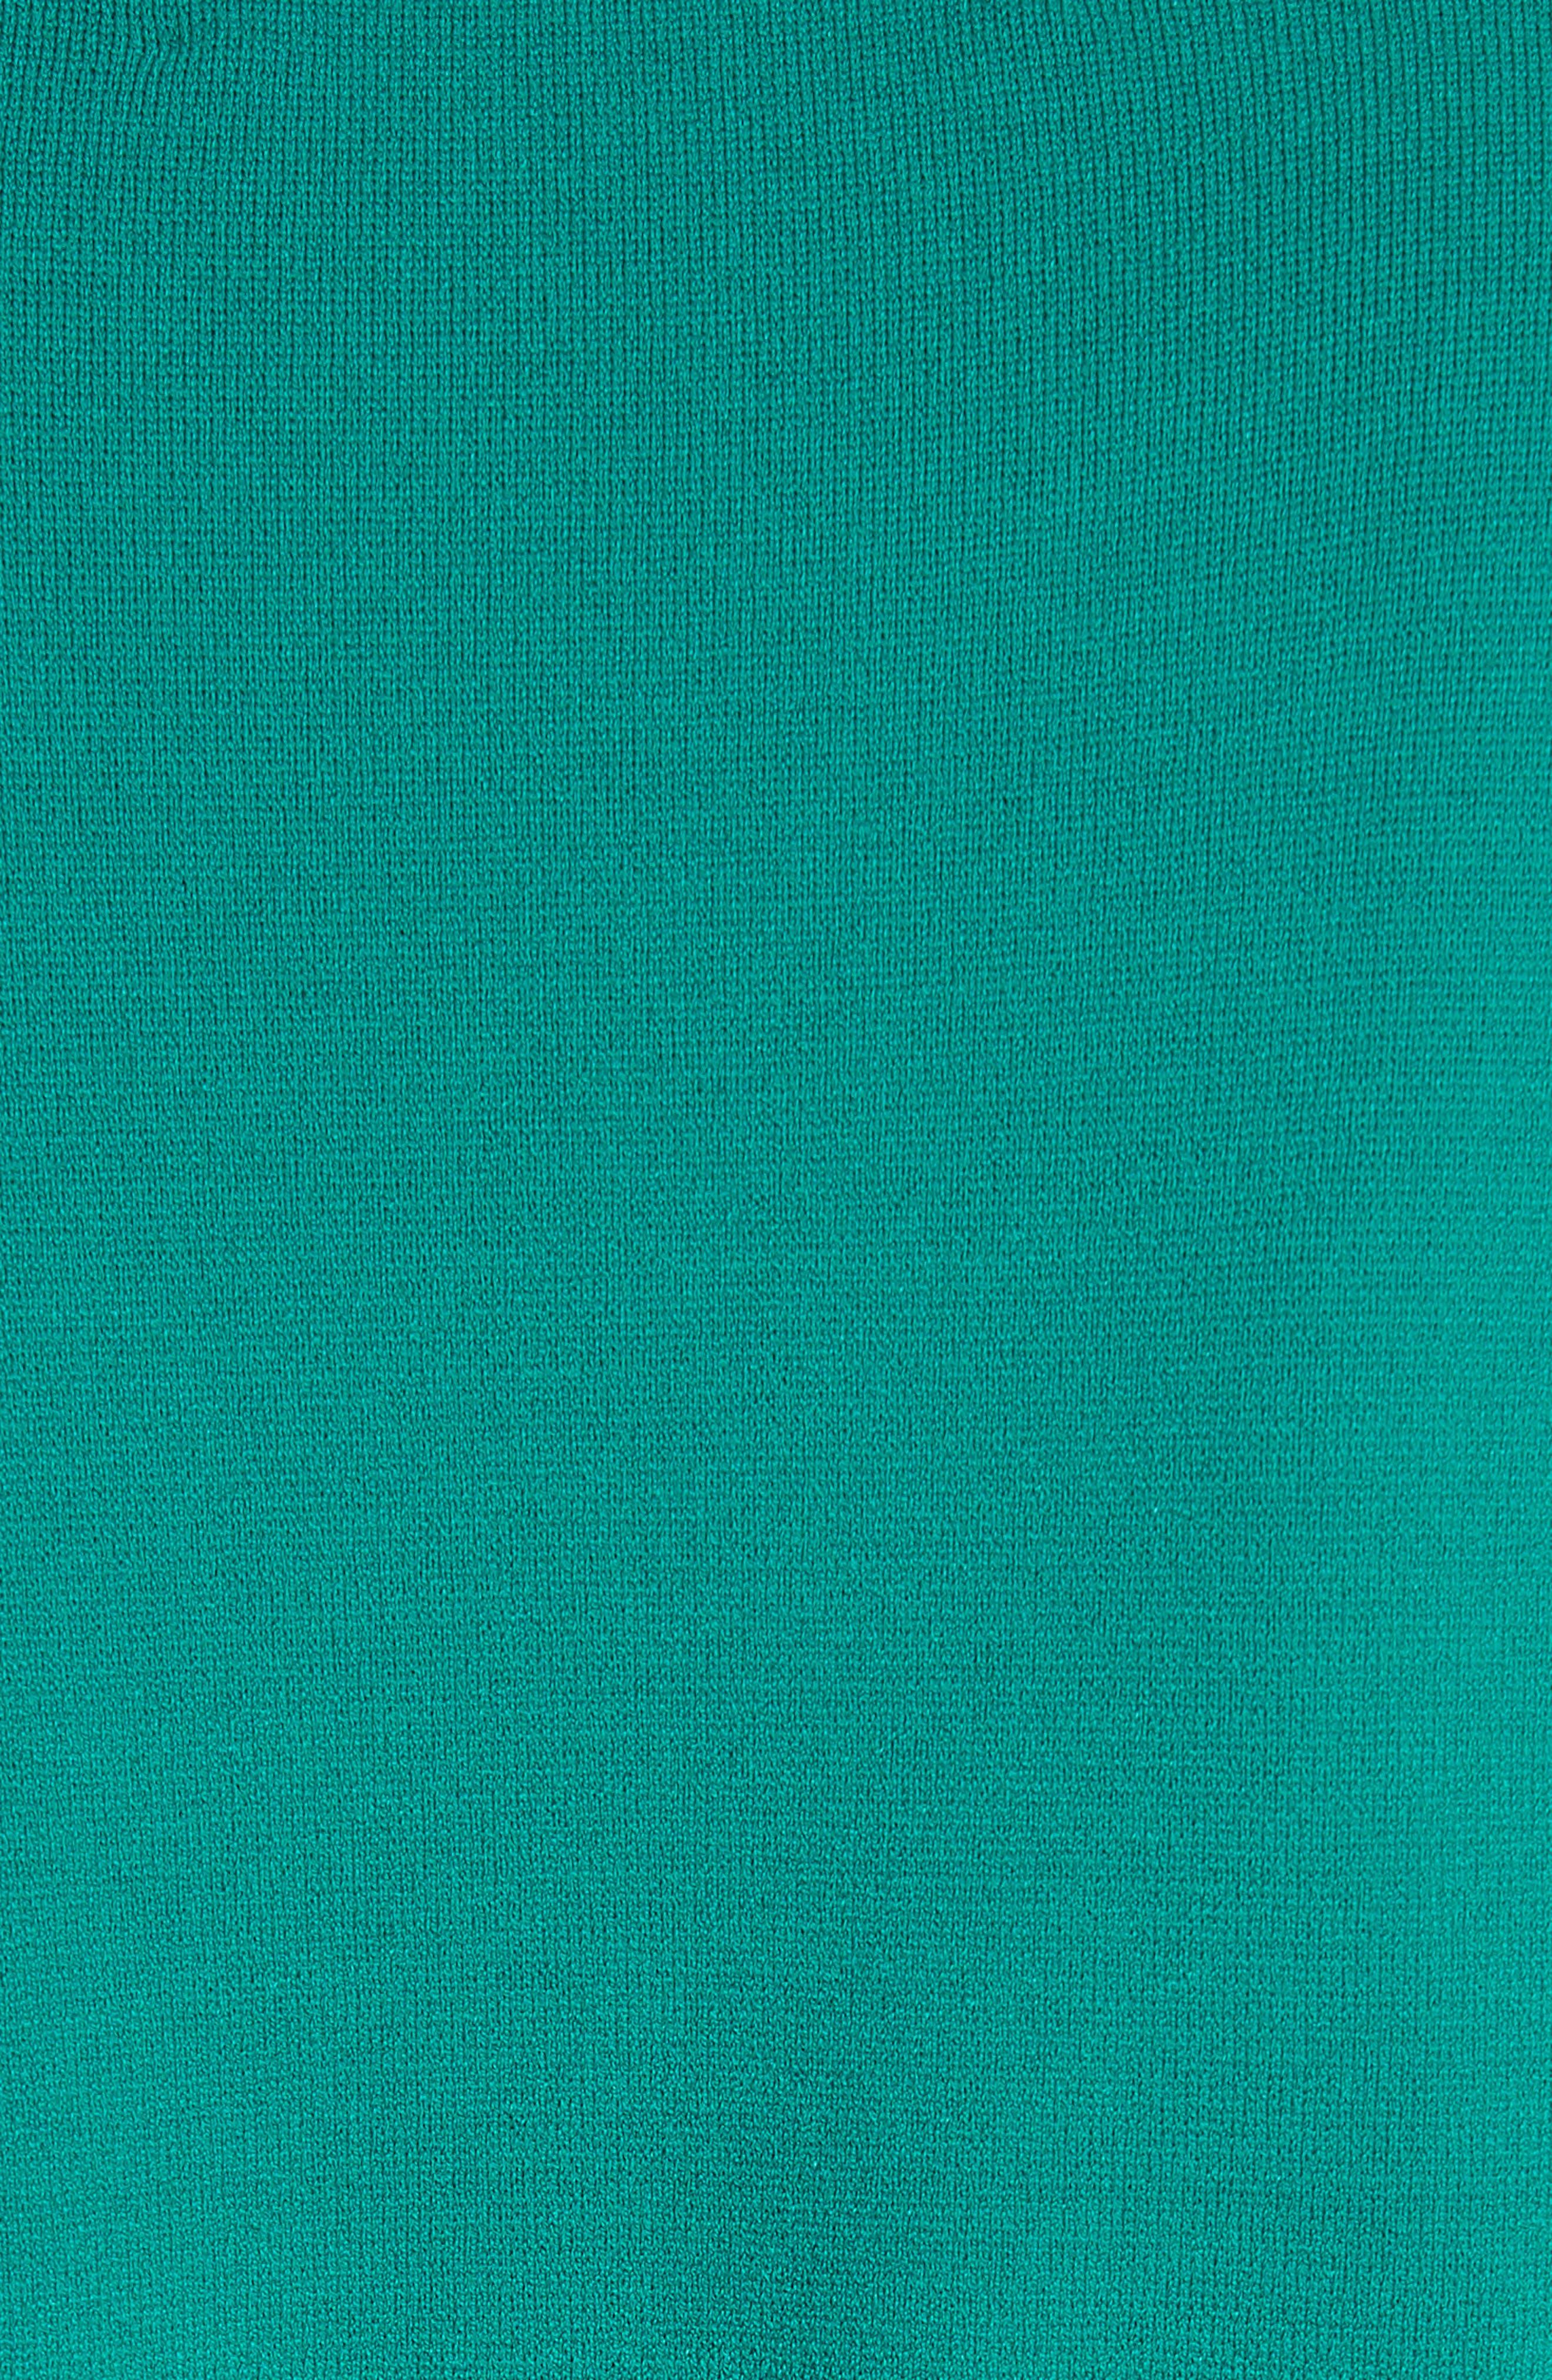 Diane von Furstenberg Knit Wrap Top,                             Alternate thumbnail 5, color,                             340